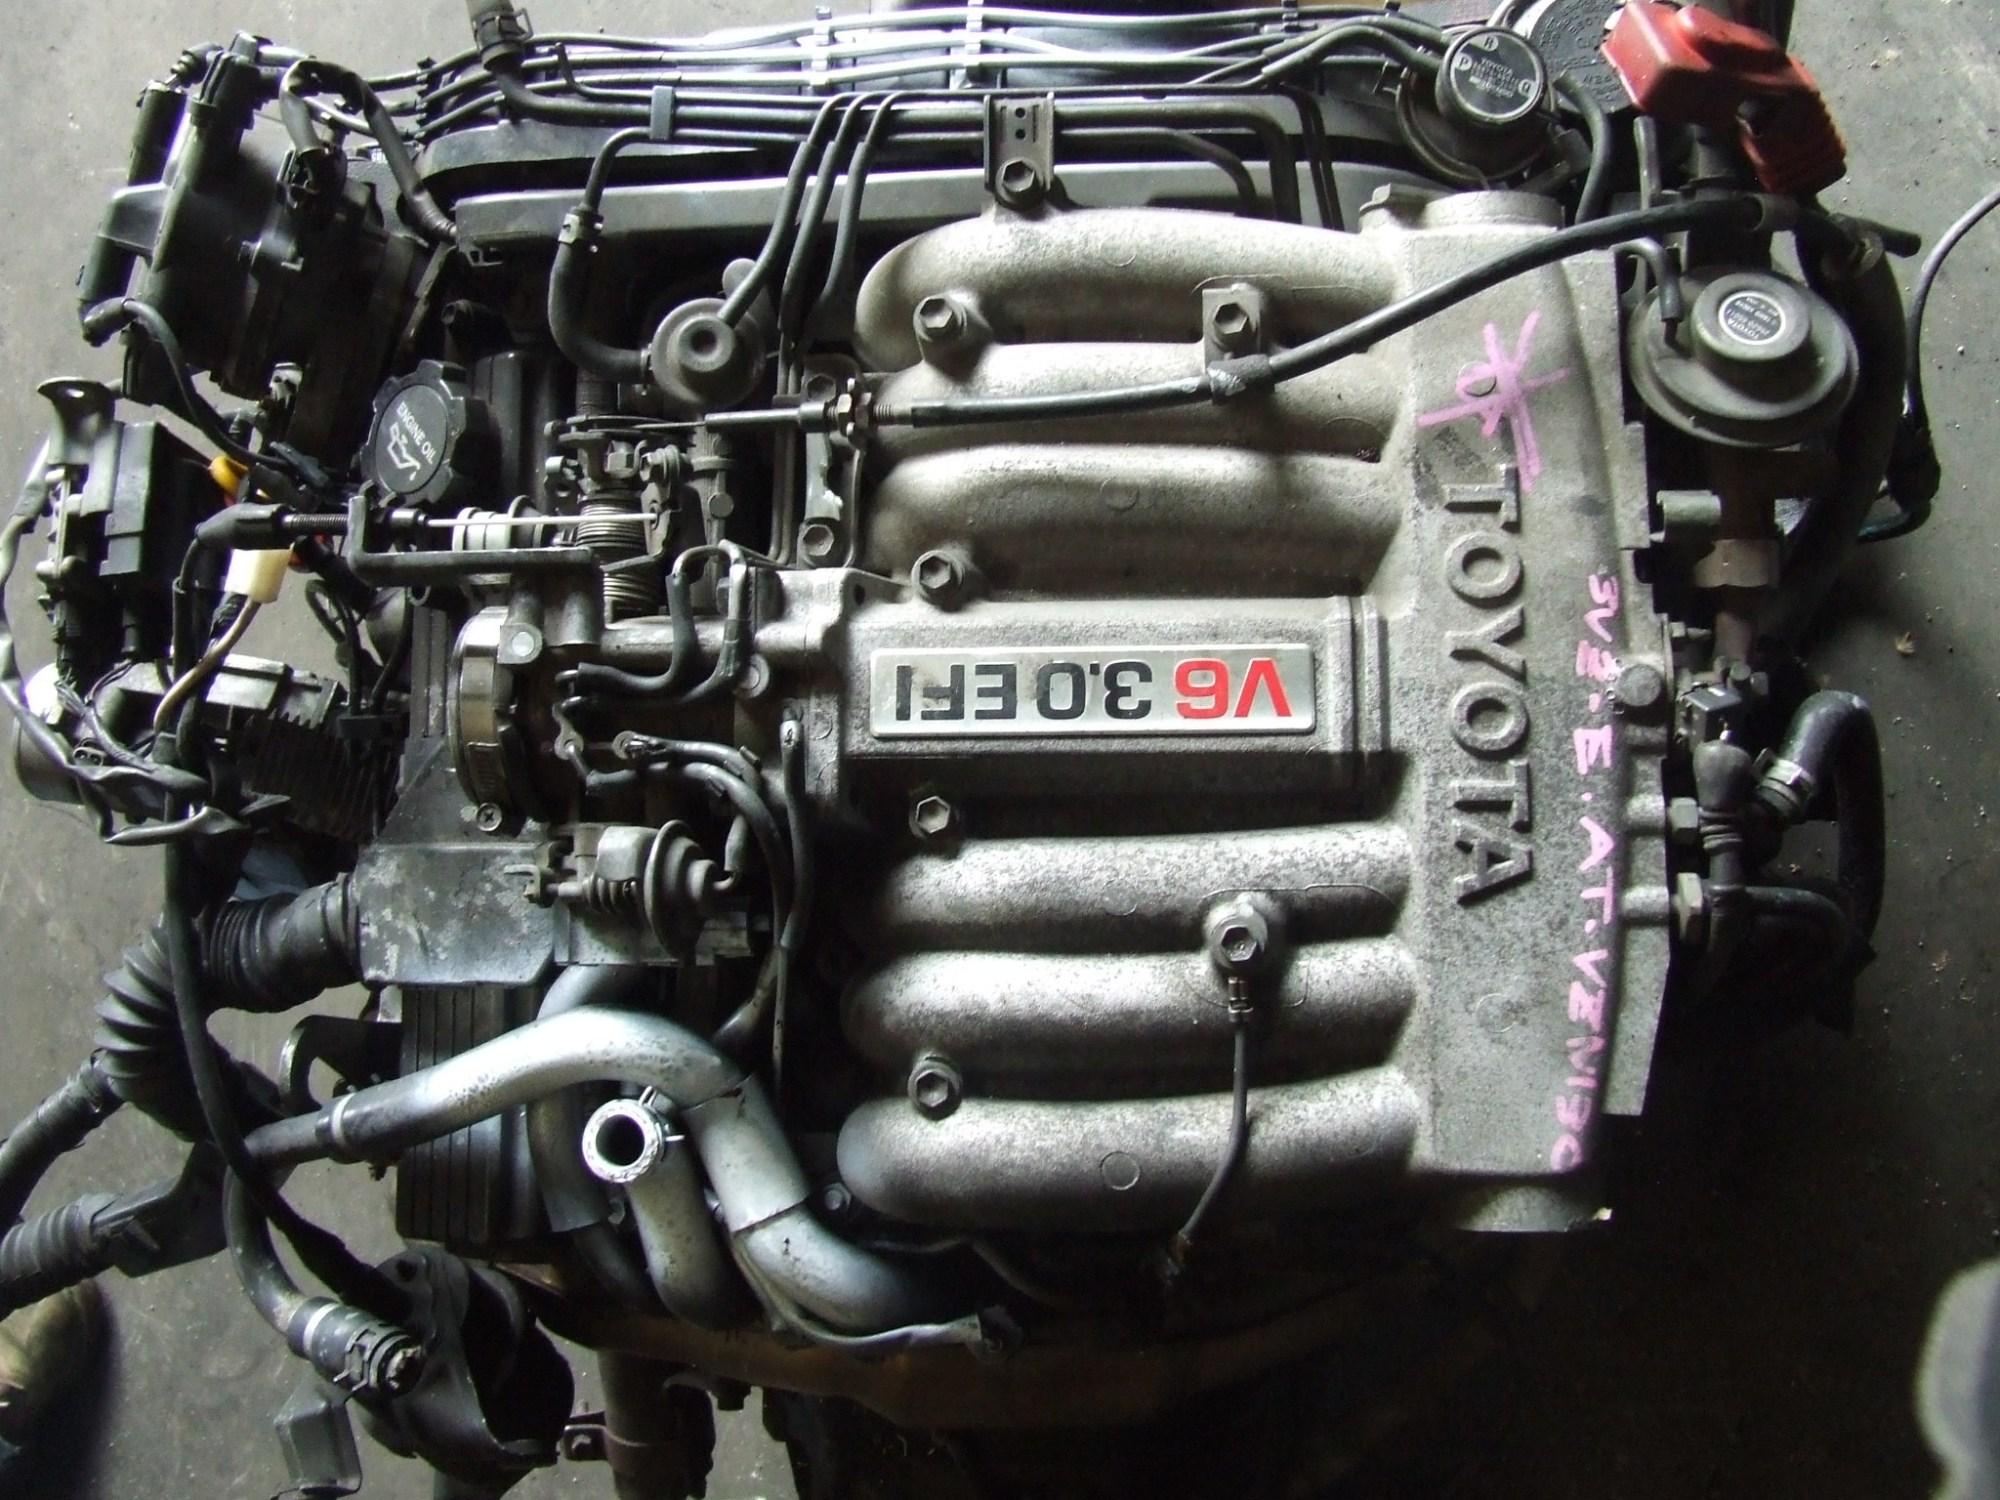 hight resolution of 1995 toyota 4runner engine diagram toyota 4runner engines used toyota 4runner engine of 1995 toyota 4runner